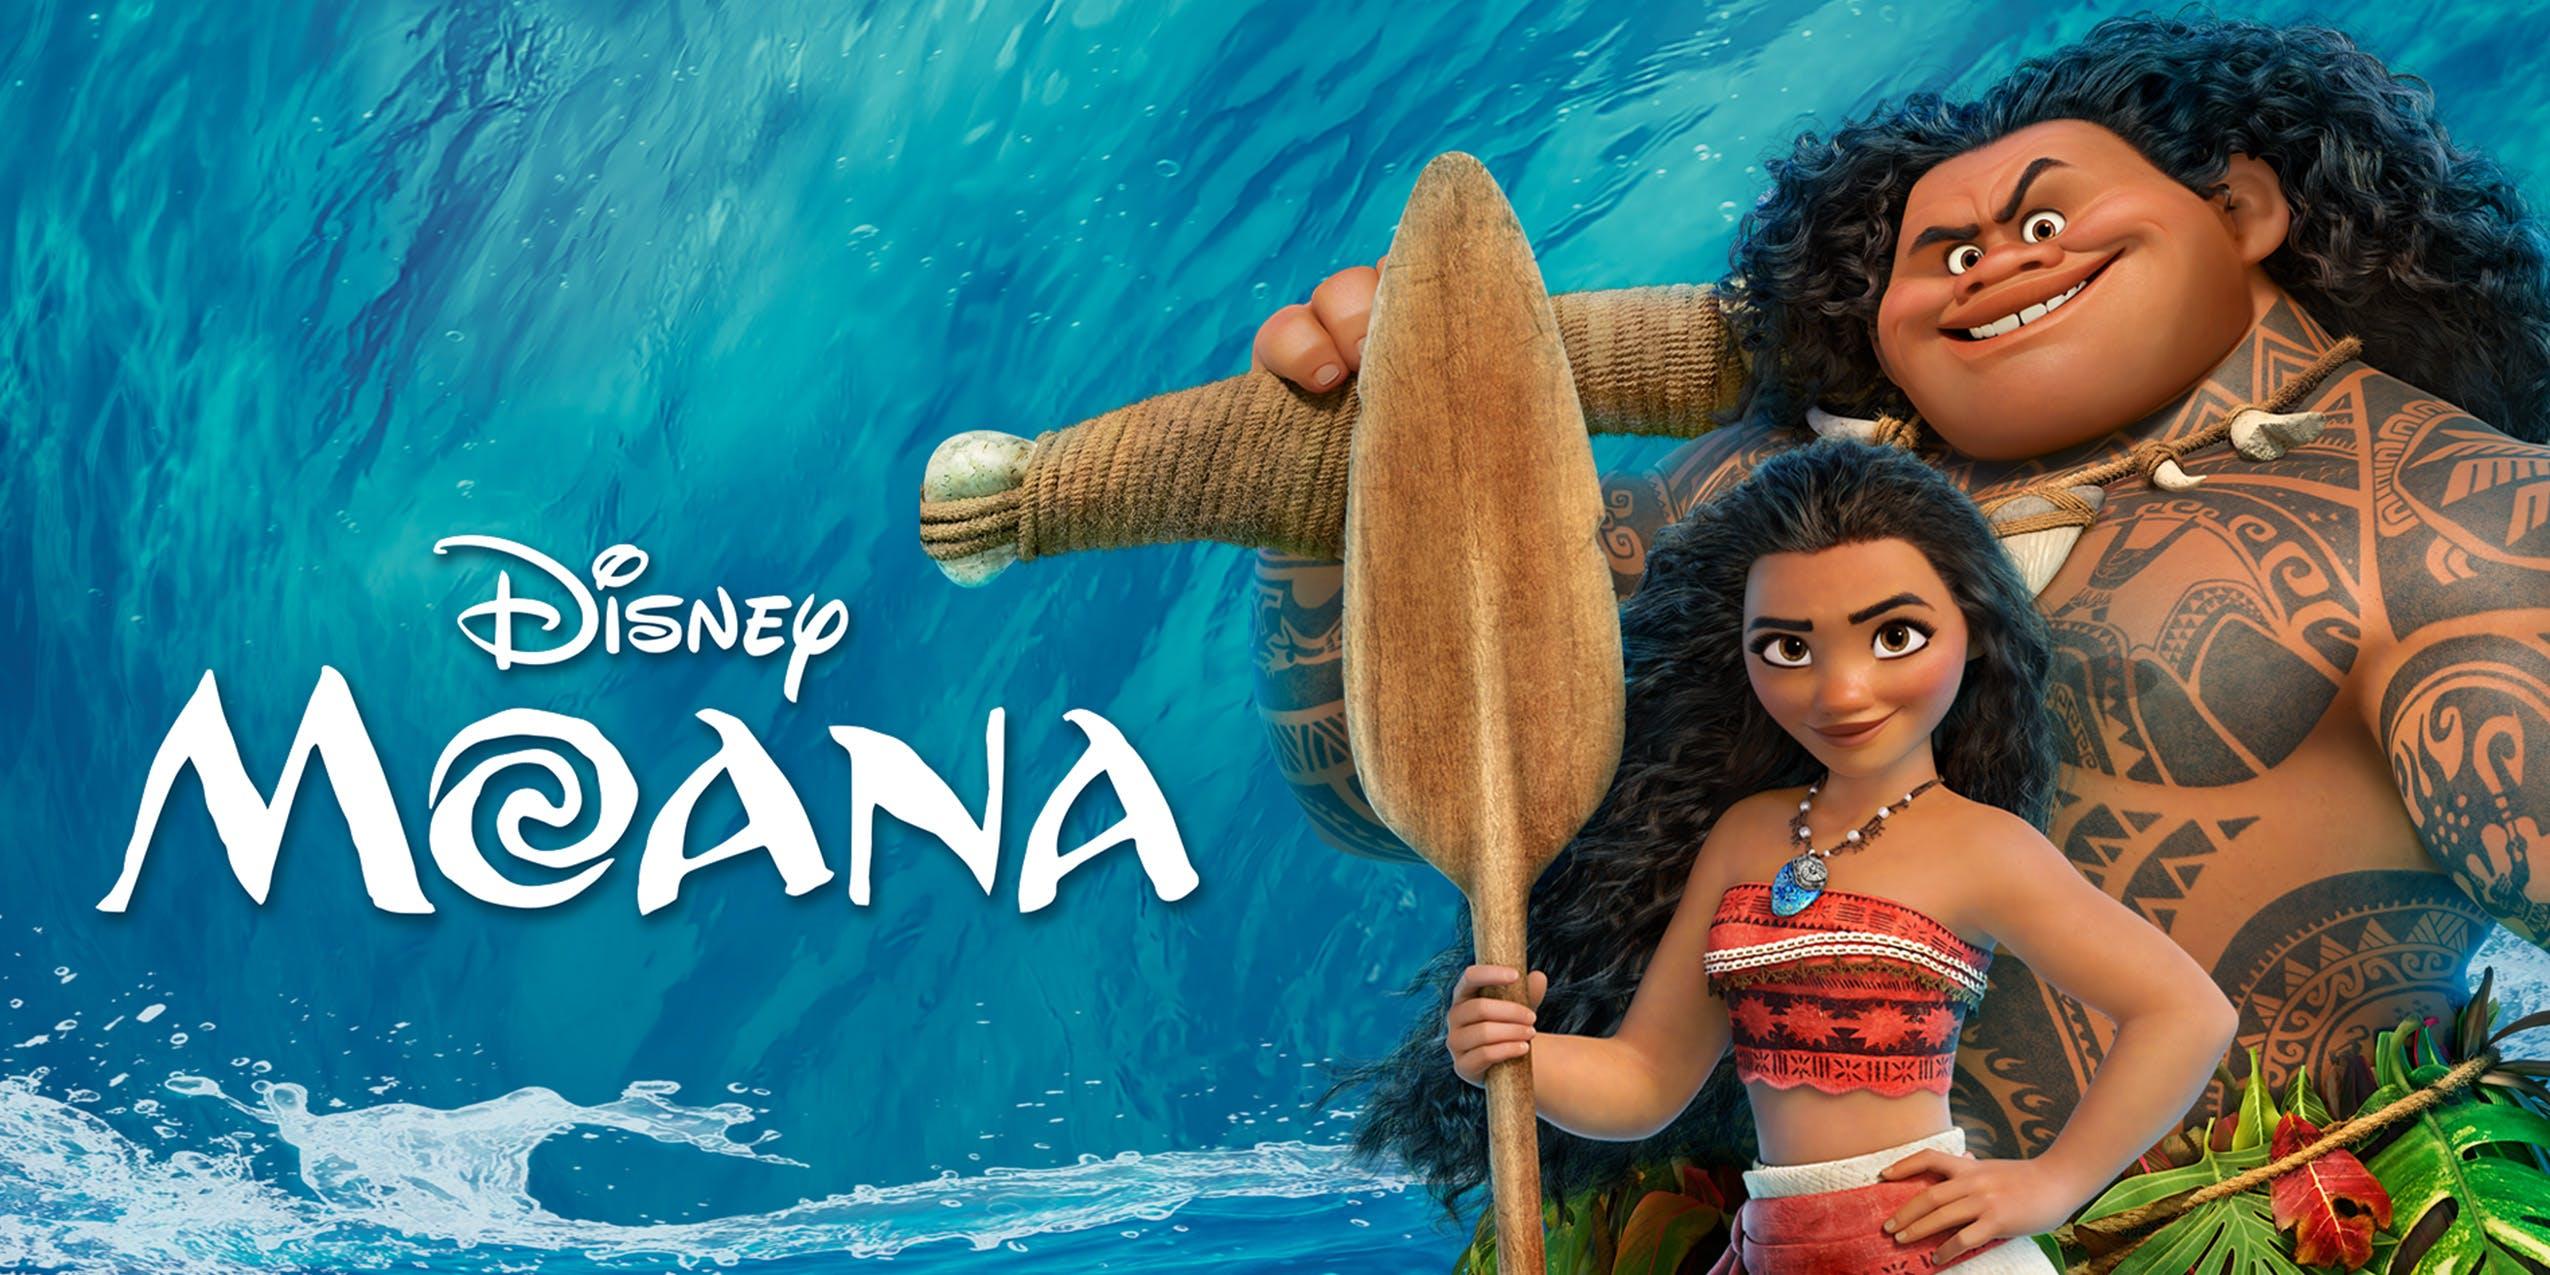 best movies Disney Plus Moana